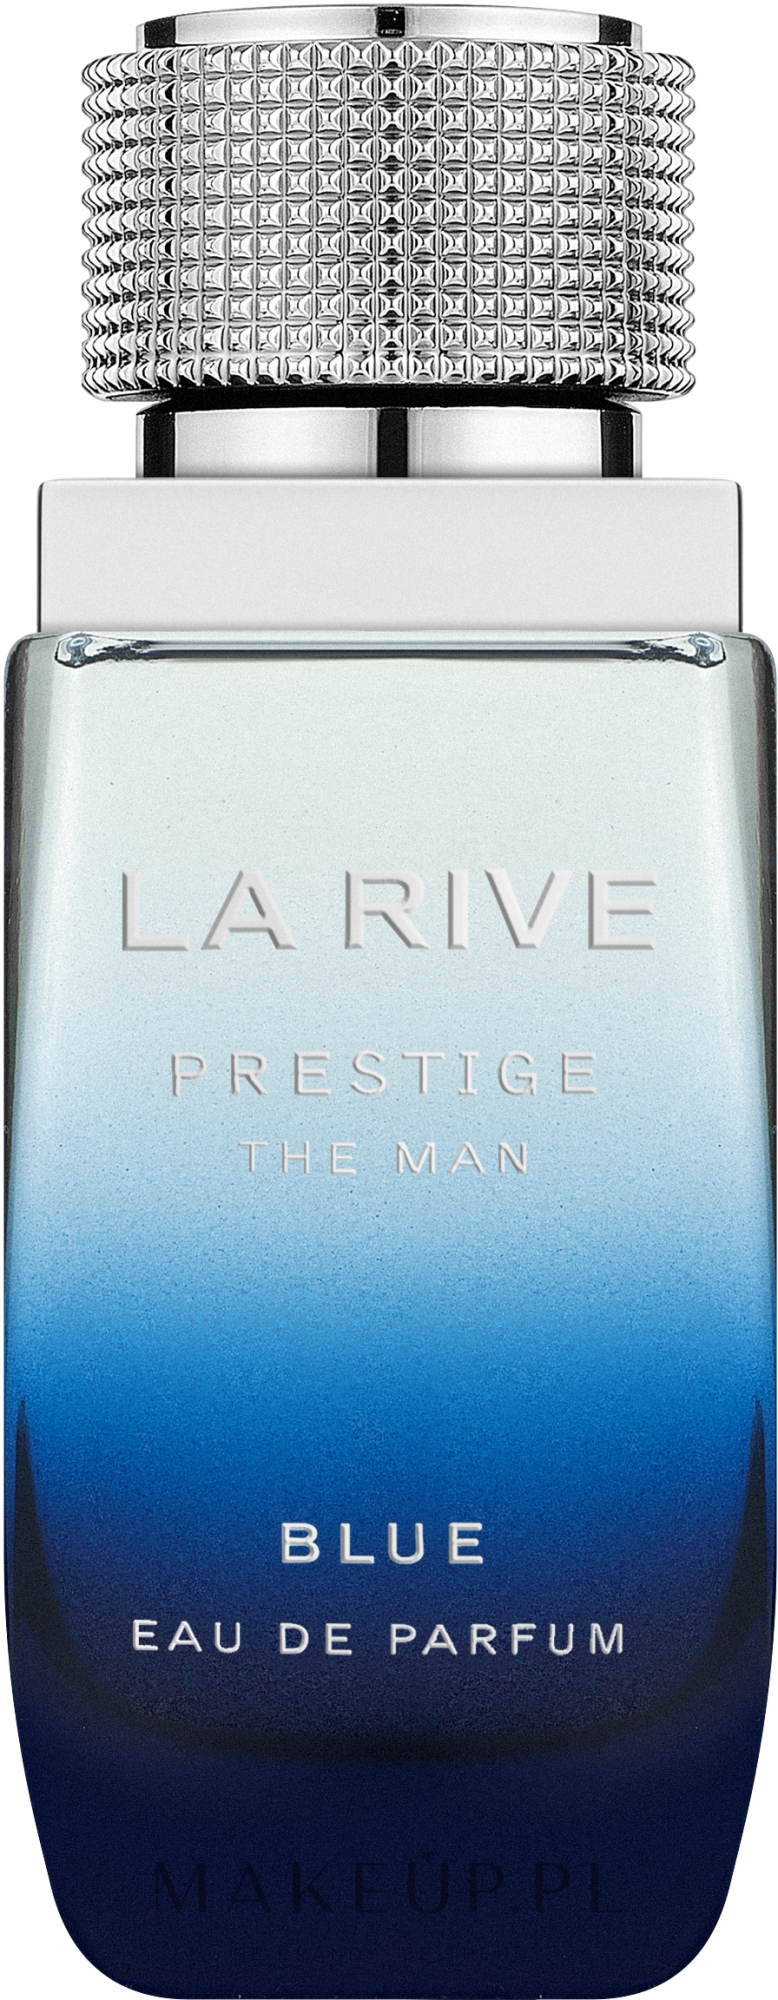 la rive prestige - the man blue